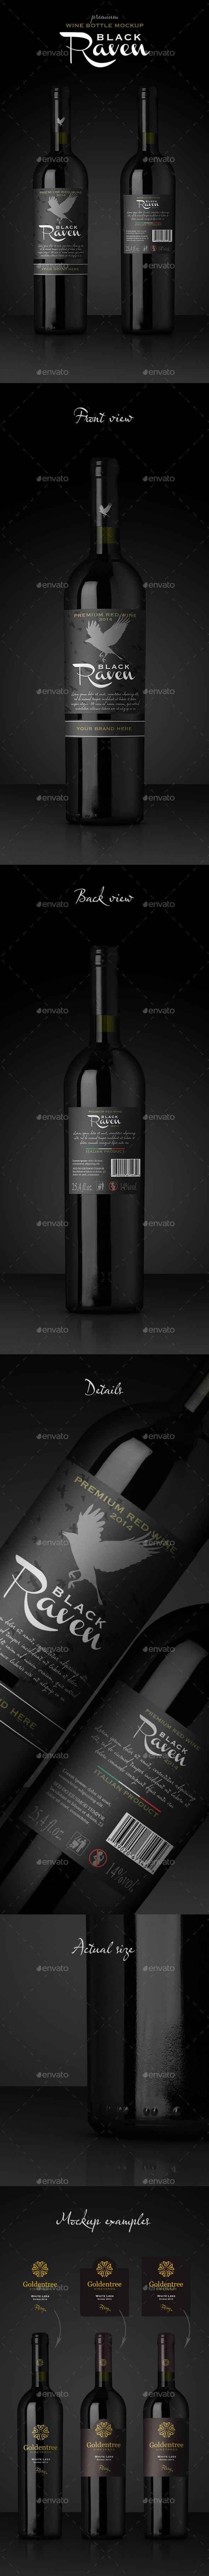 Premium Red Wine Mockup - Food and Drink Packaging